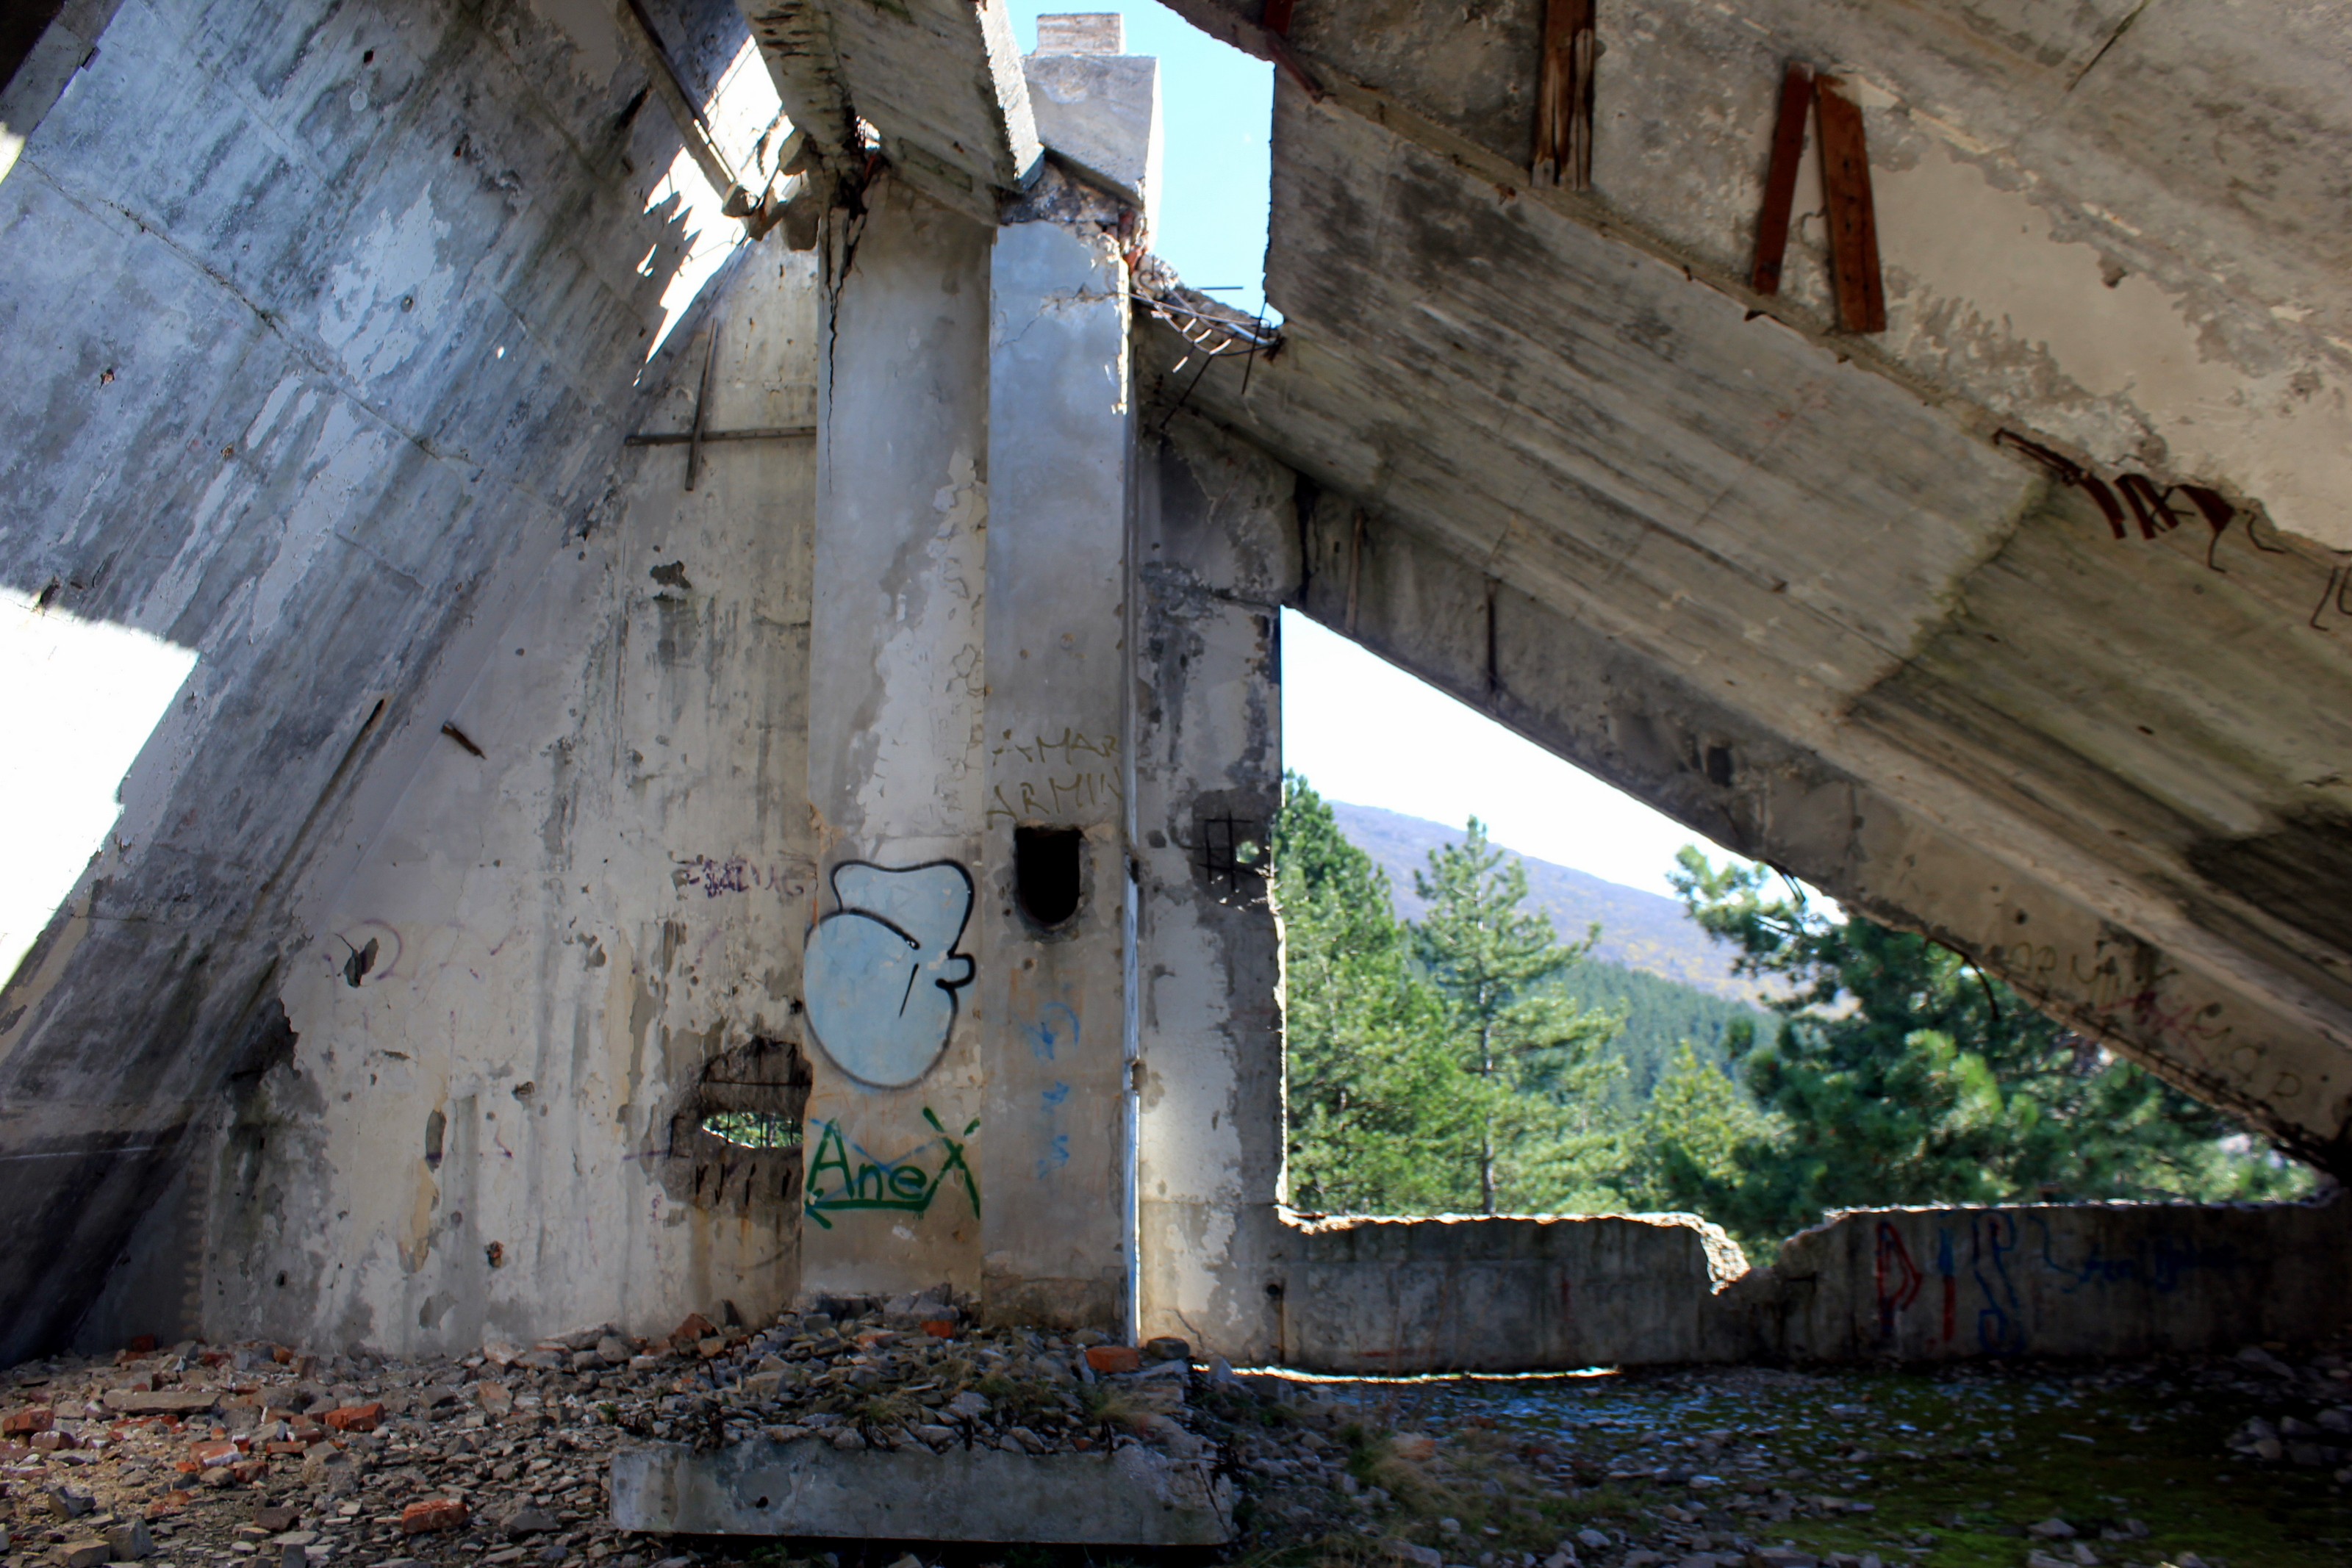 file:zlatište hotel 6 - wikimedia commons